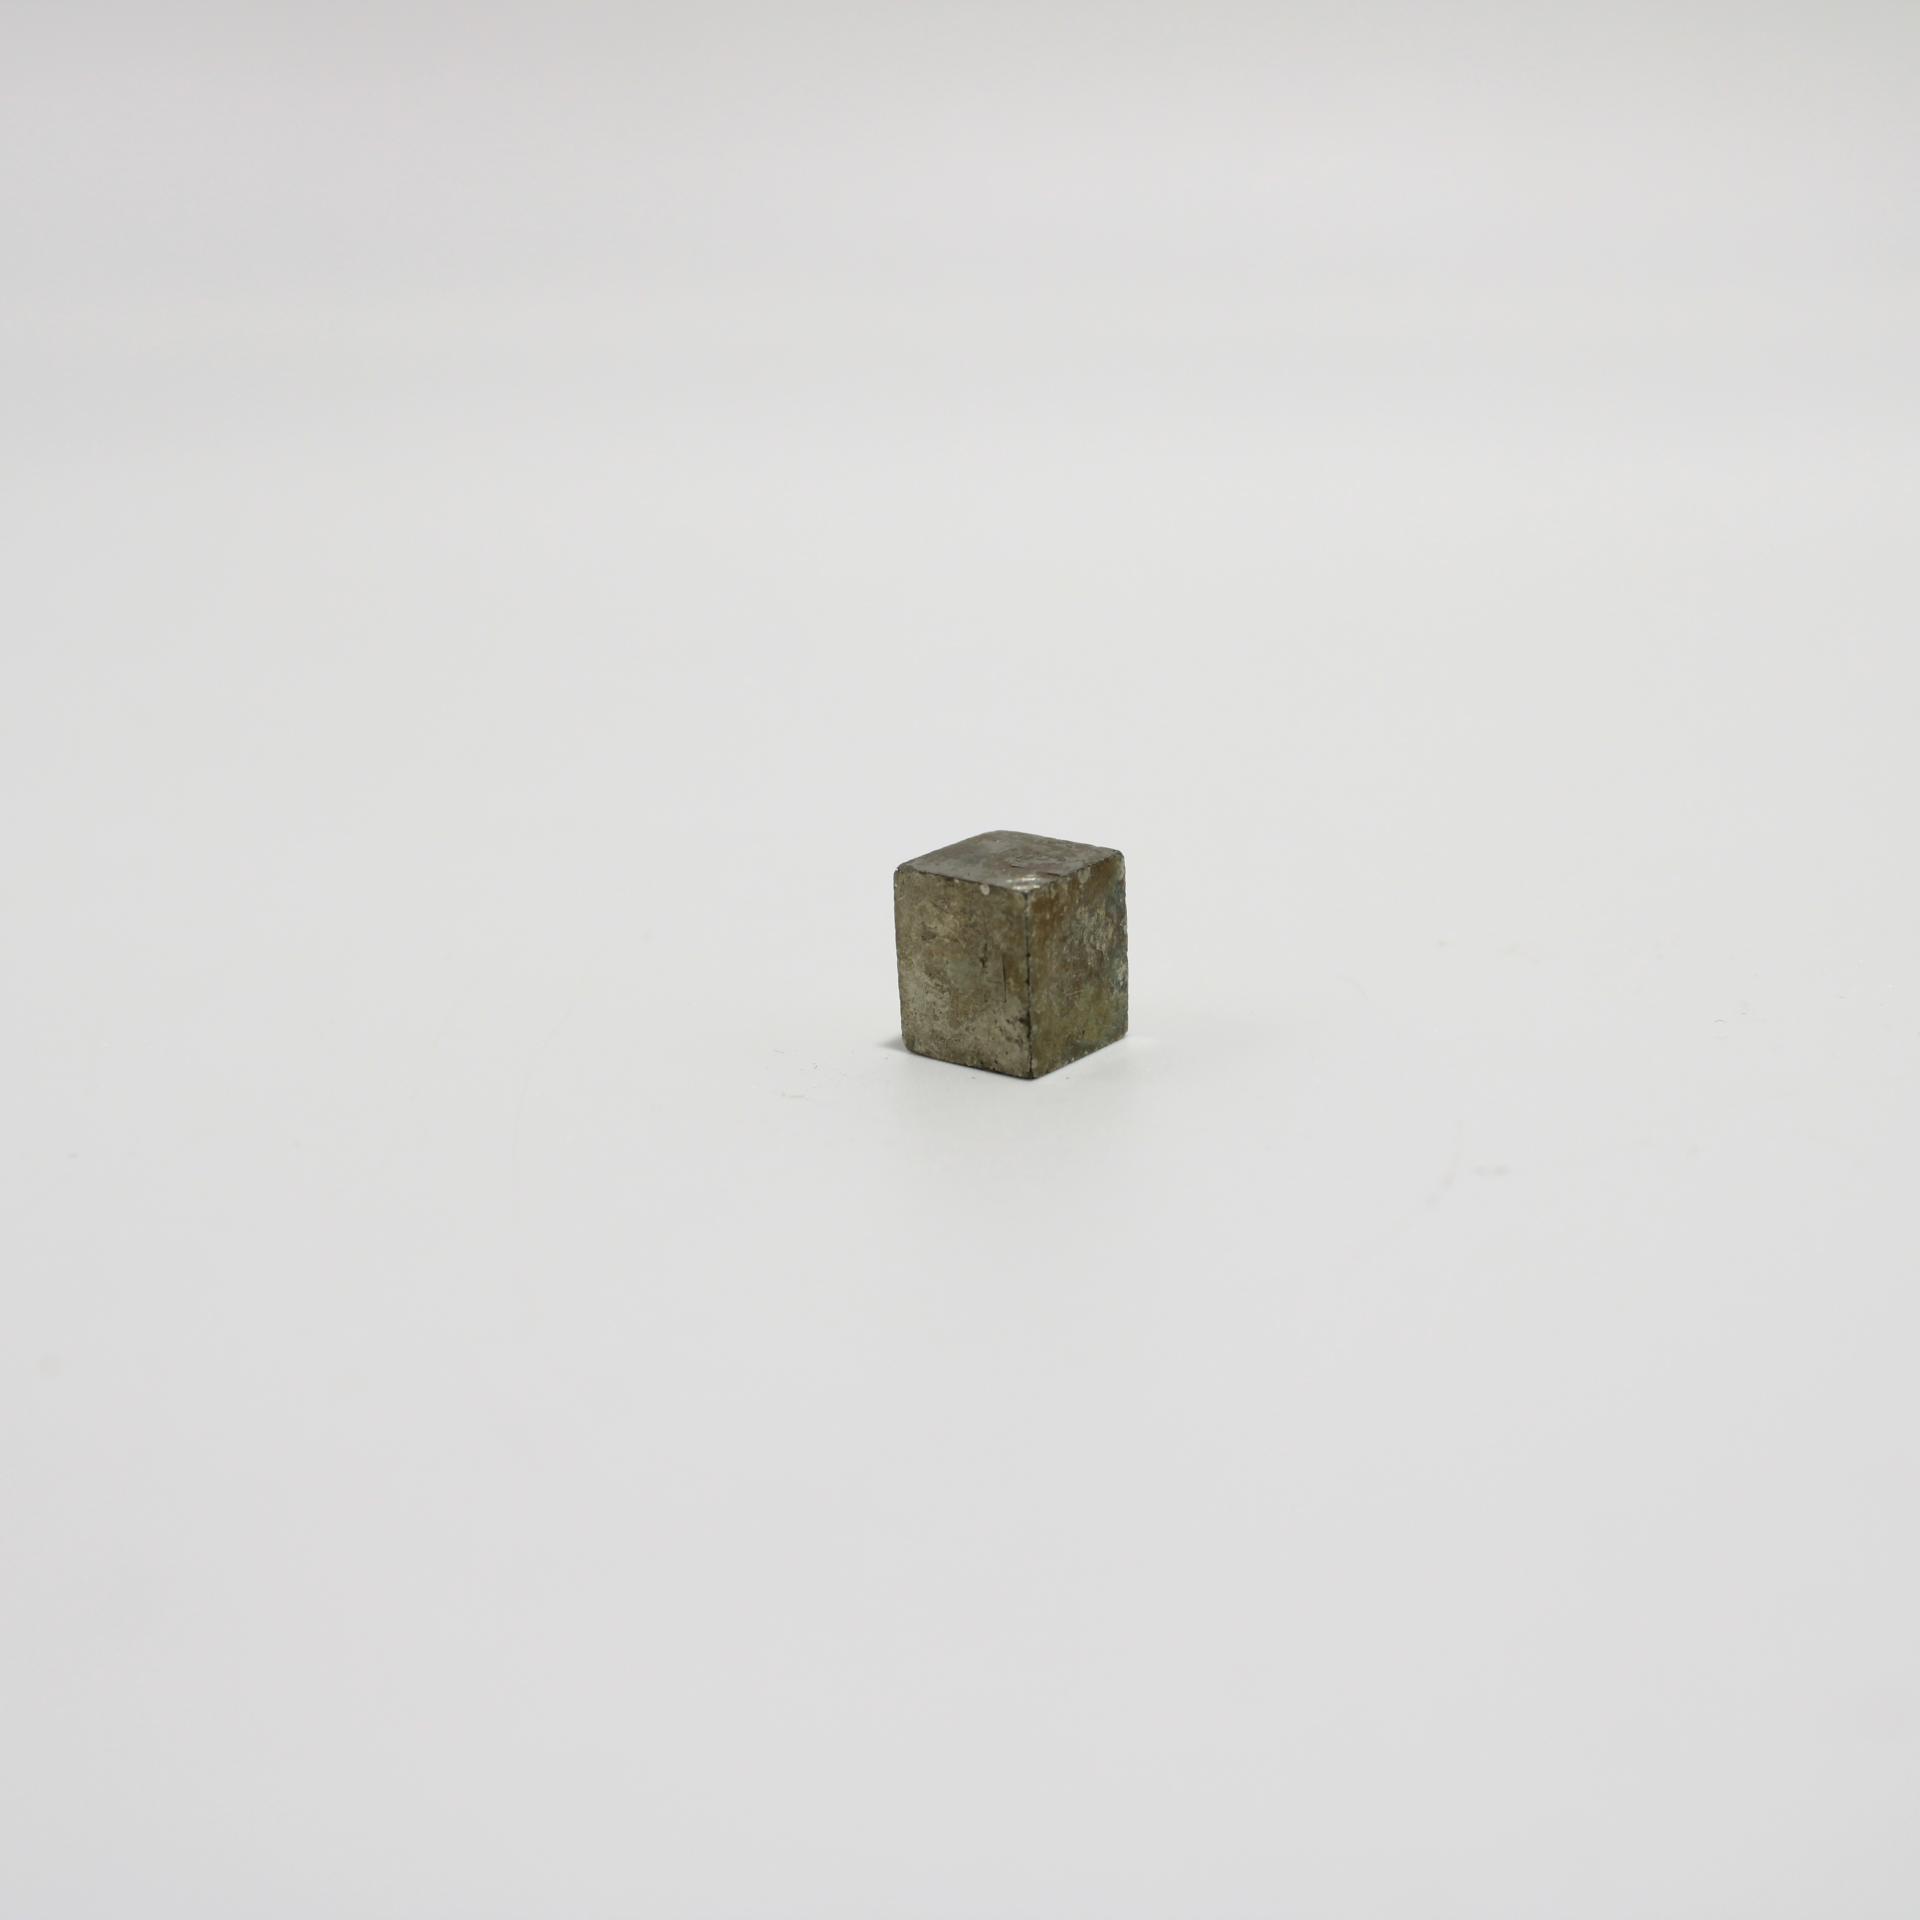 I73 pyritecube 2